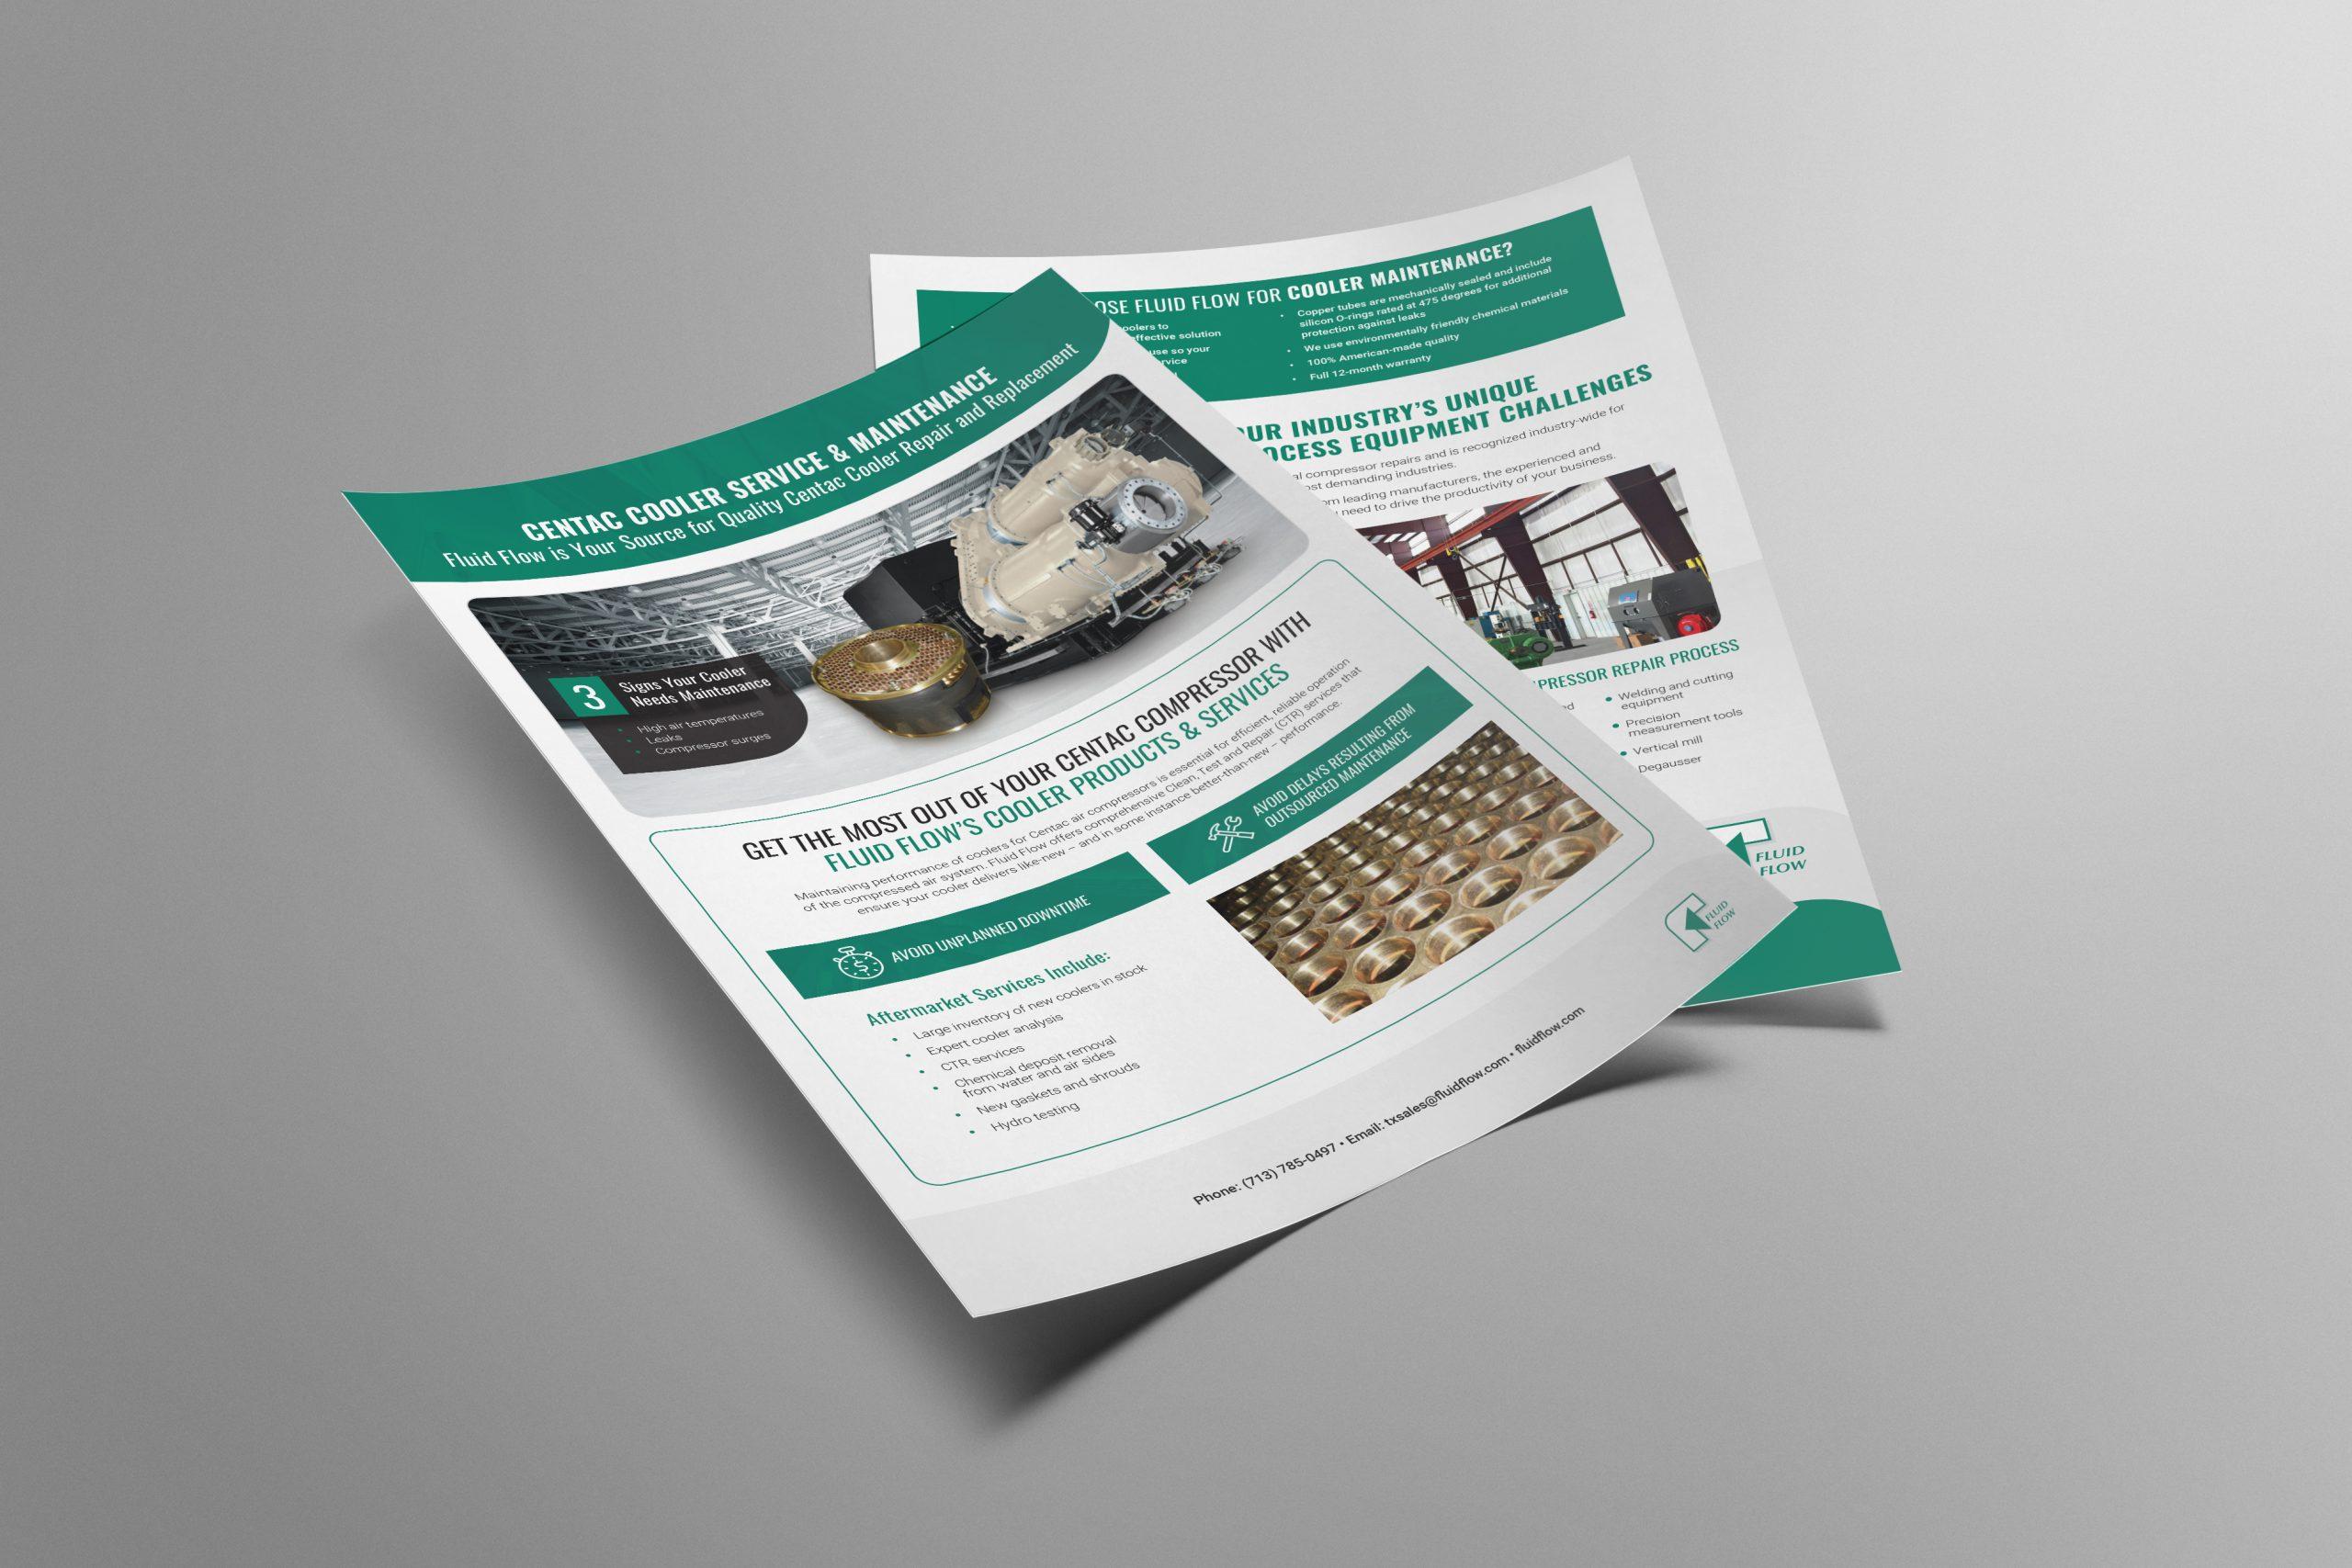 Brochure: Solving Your Centac Cooler Service & Maintenance Issues